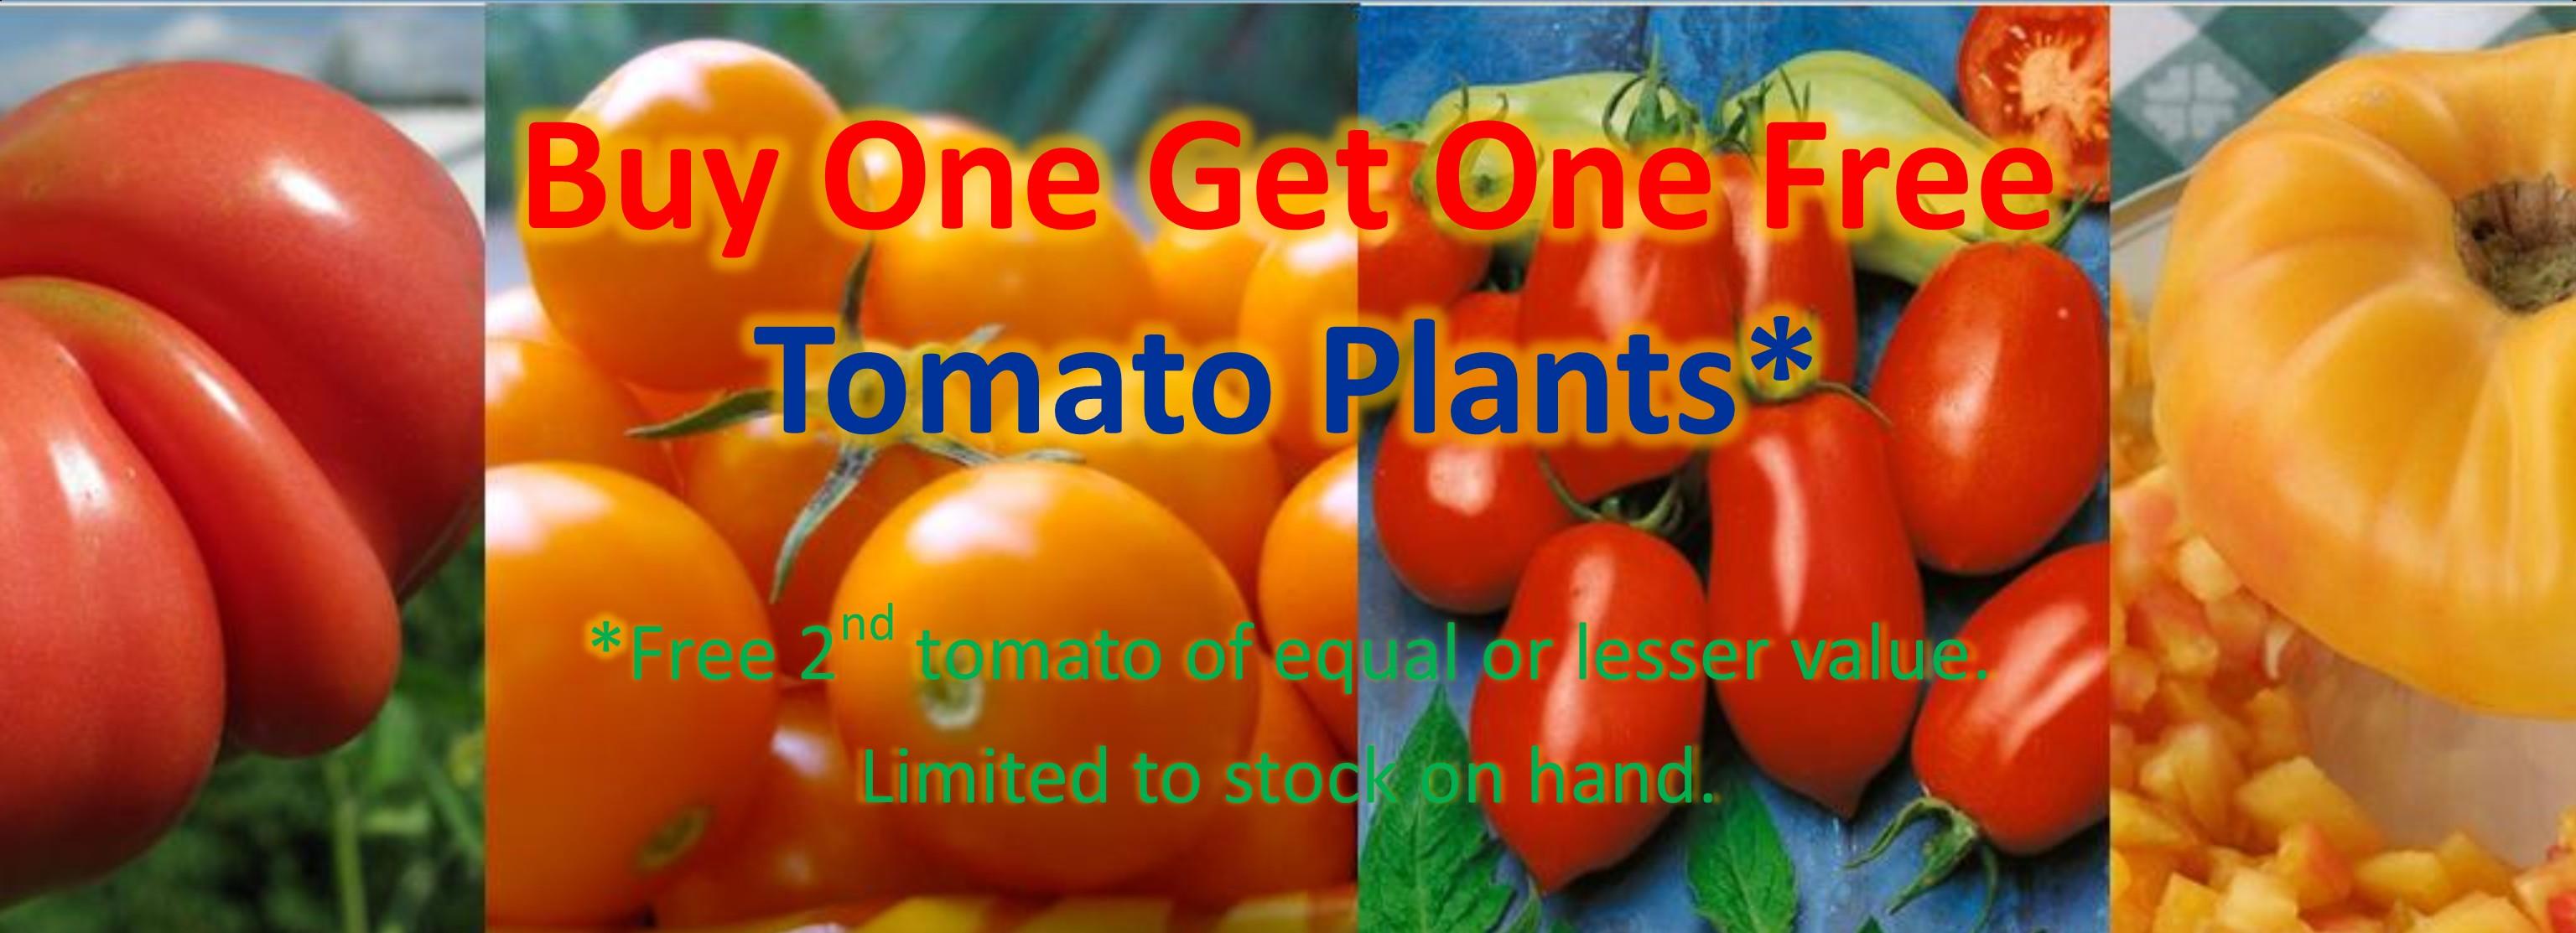 BOGO Tomato Plants